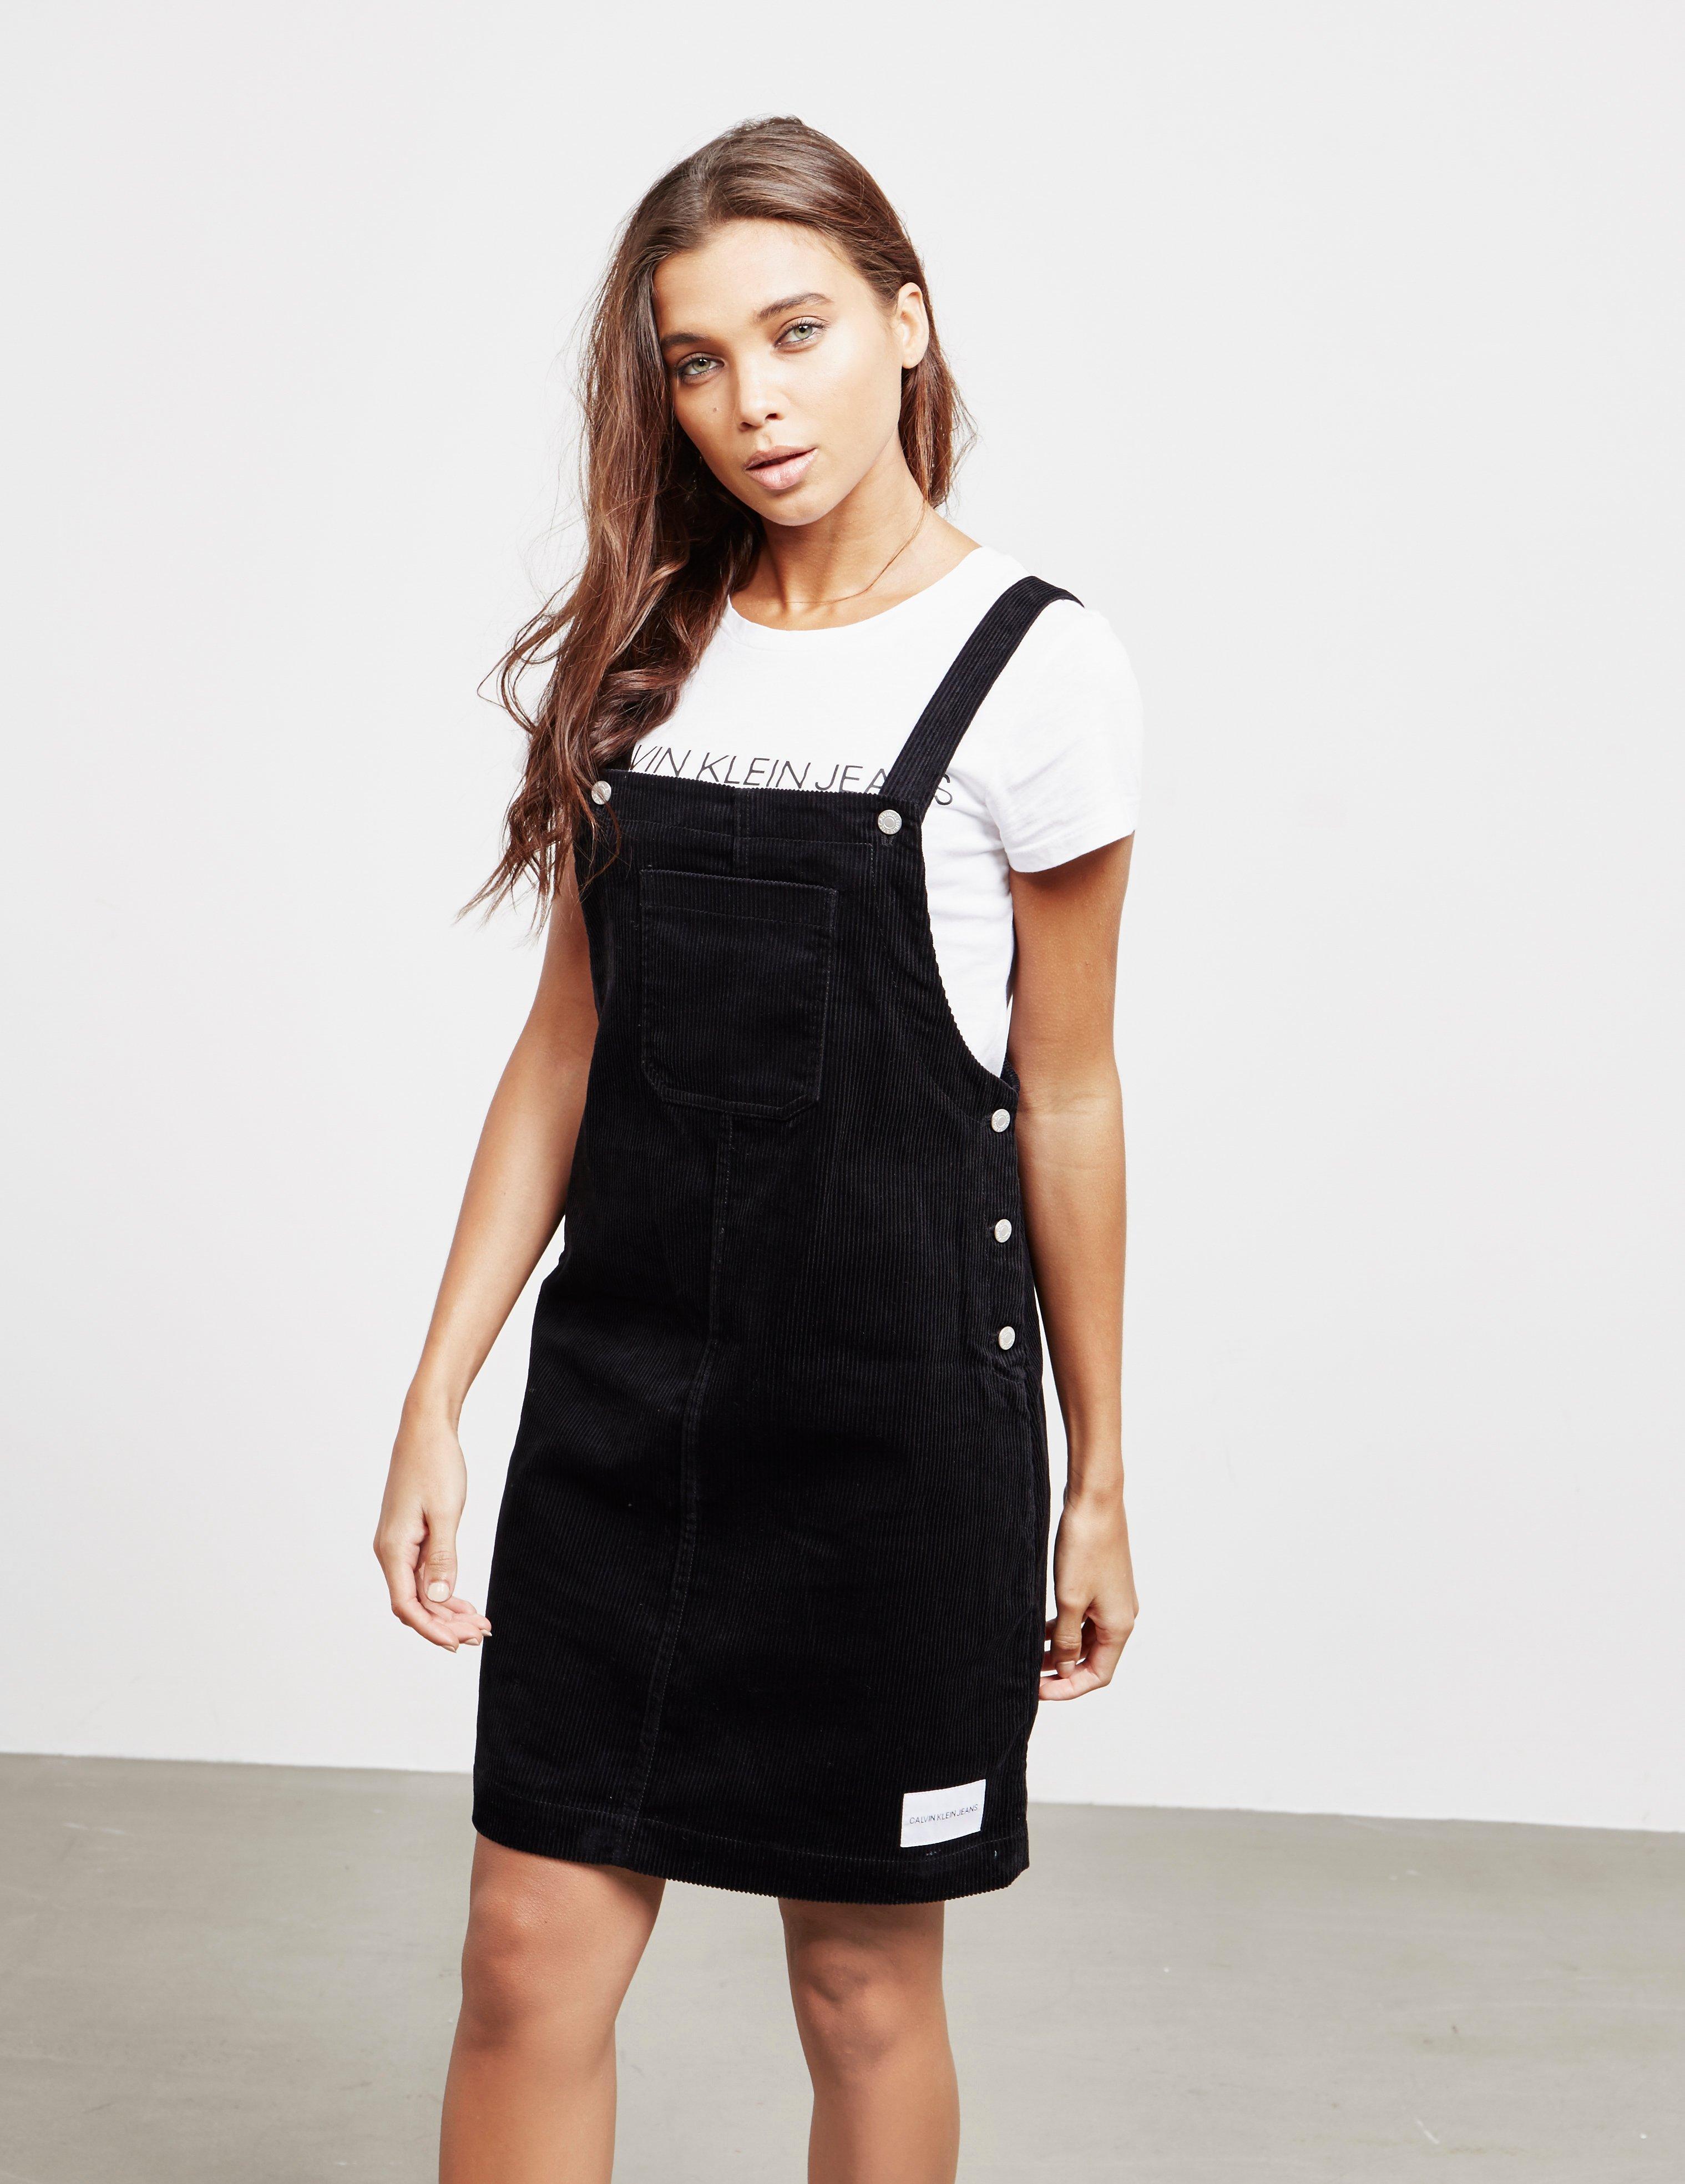 4defe685164 Calvin Klein Corduroy Pinafore Dress Black in Black - Lyst